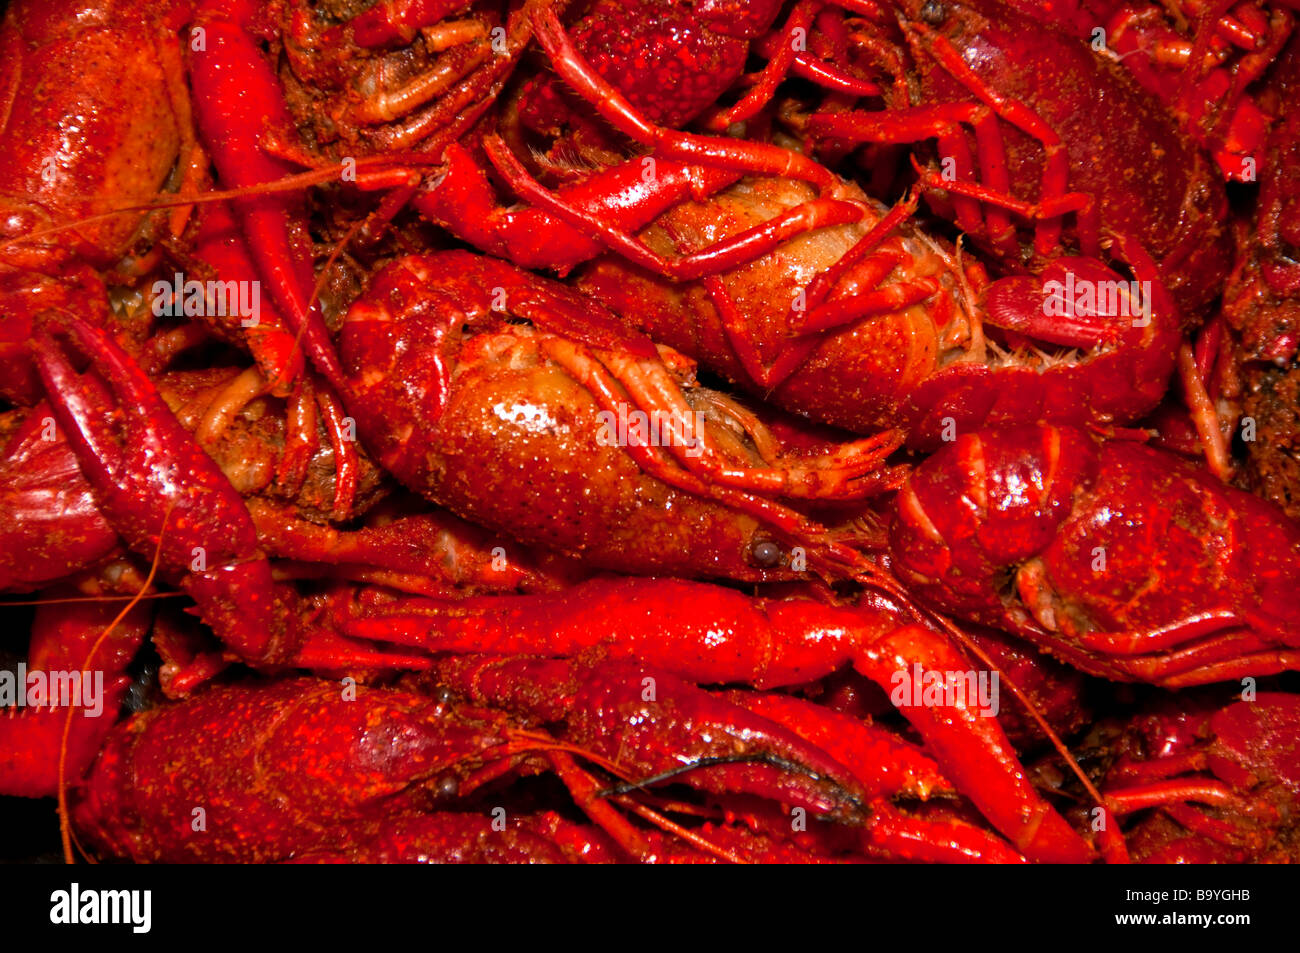 Louisiana boiled red crawfish cryfish in bowl - Stock Image